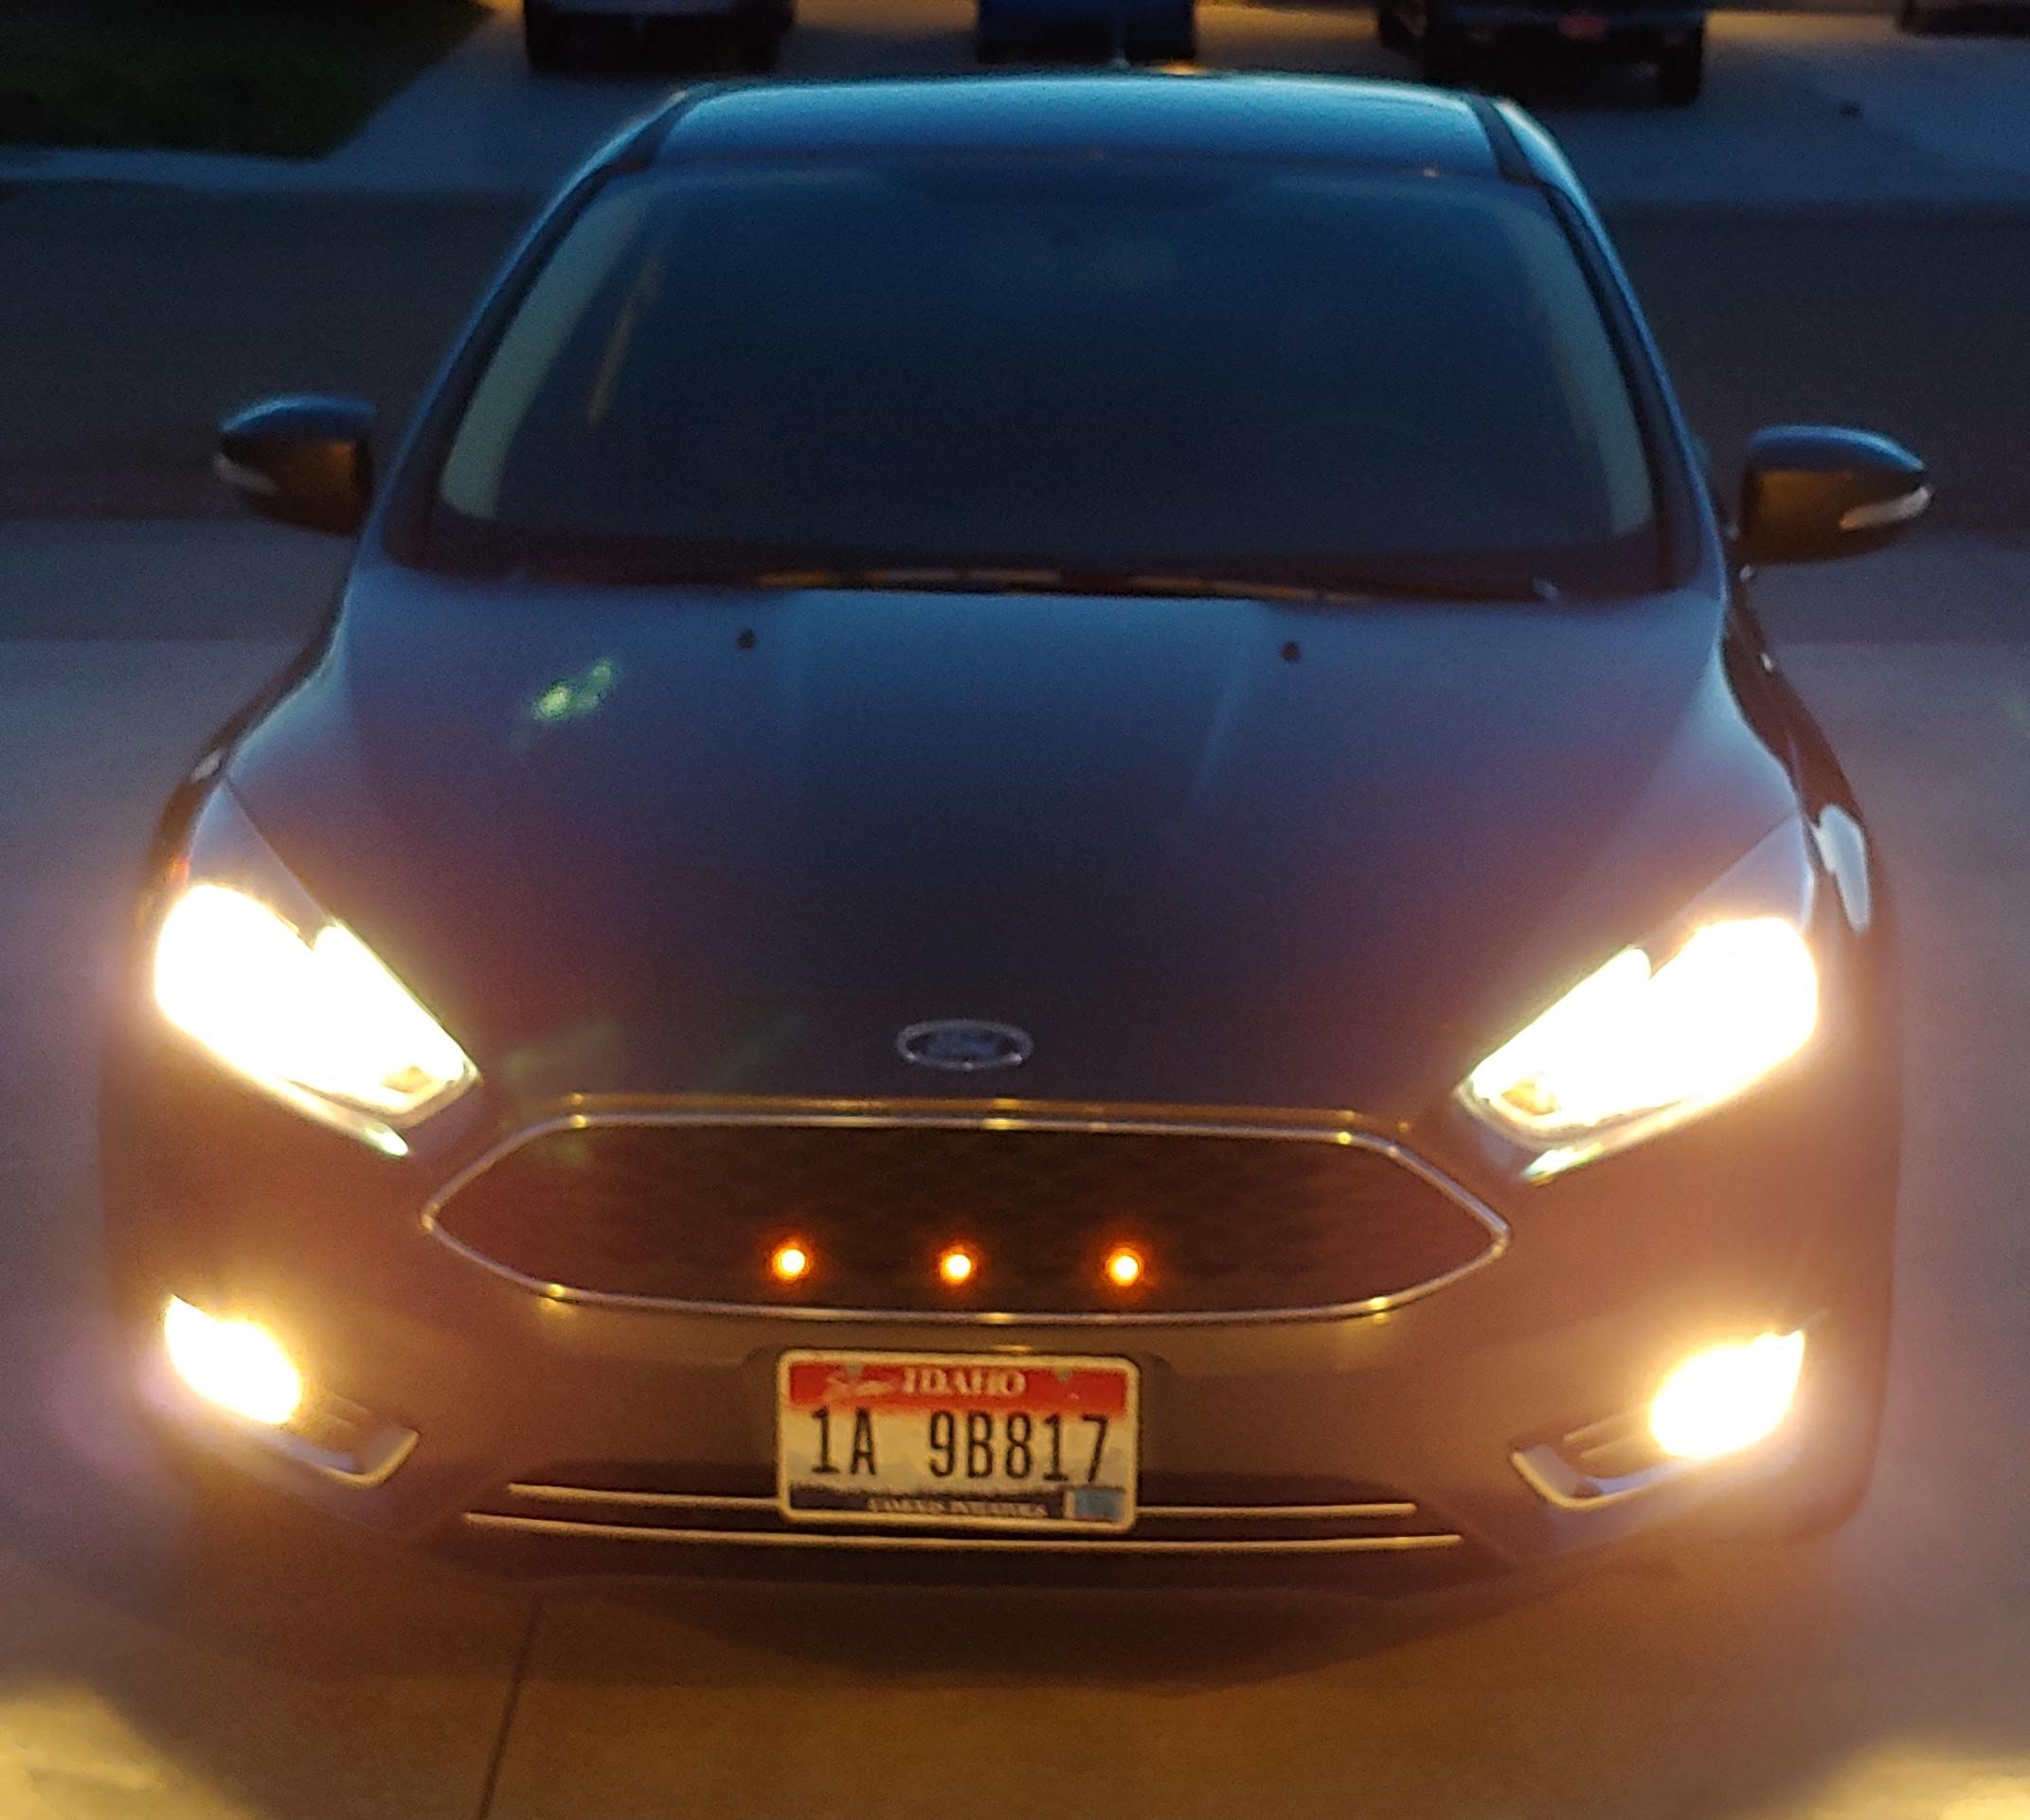 Focus Sedan-0630192201%7E2_1570935215833.jpg